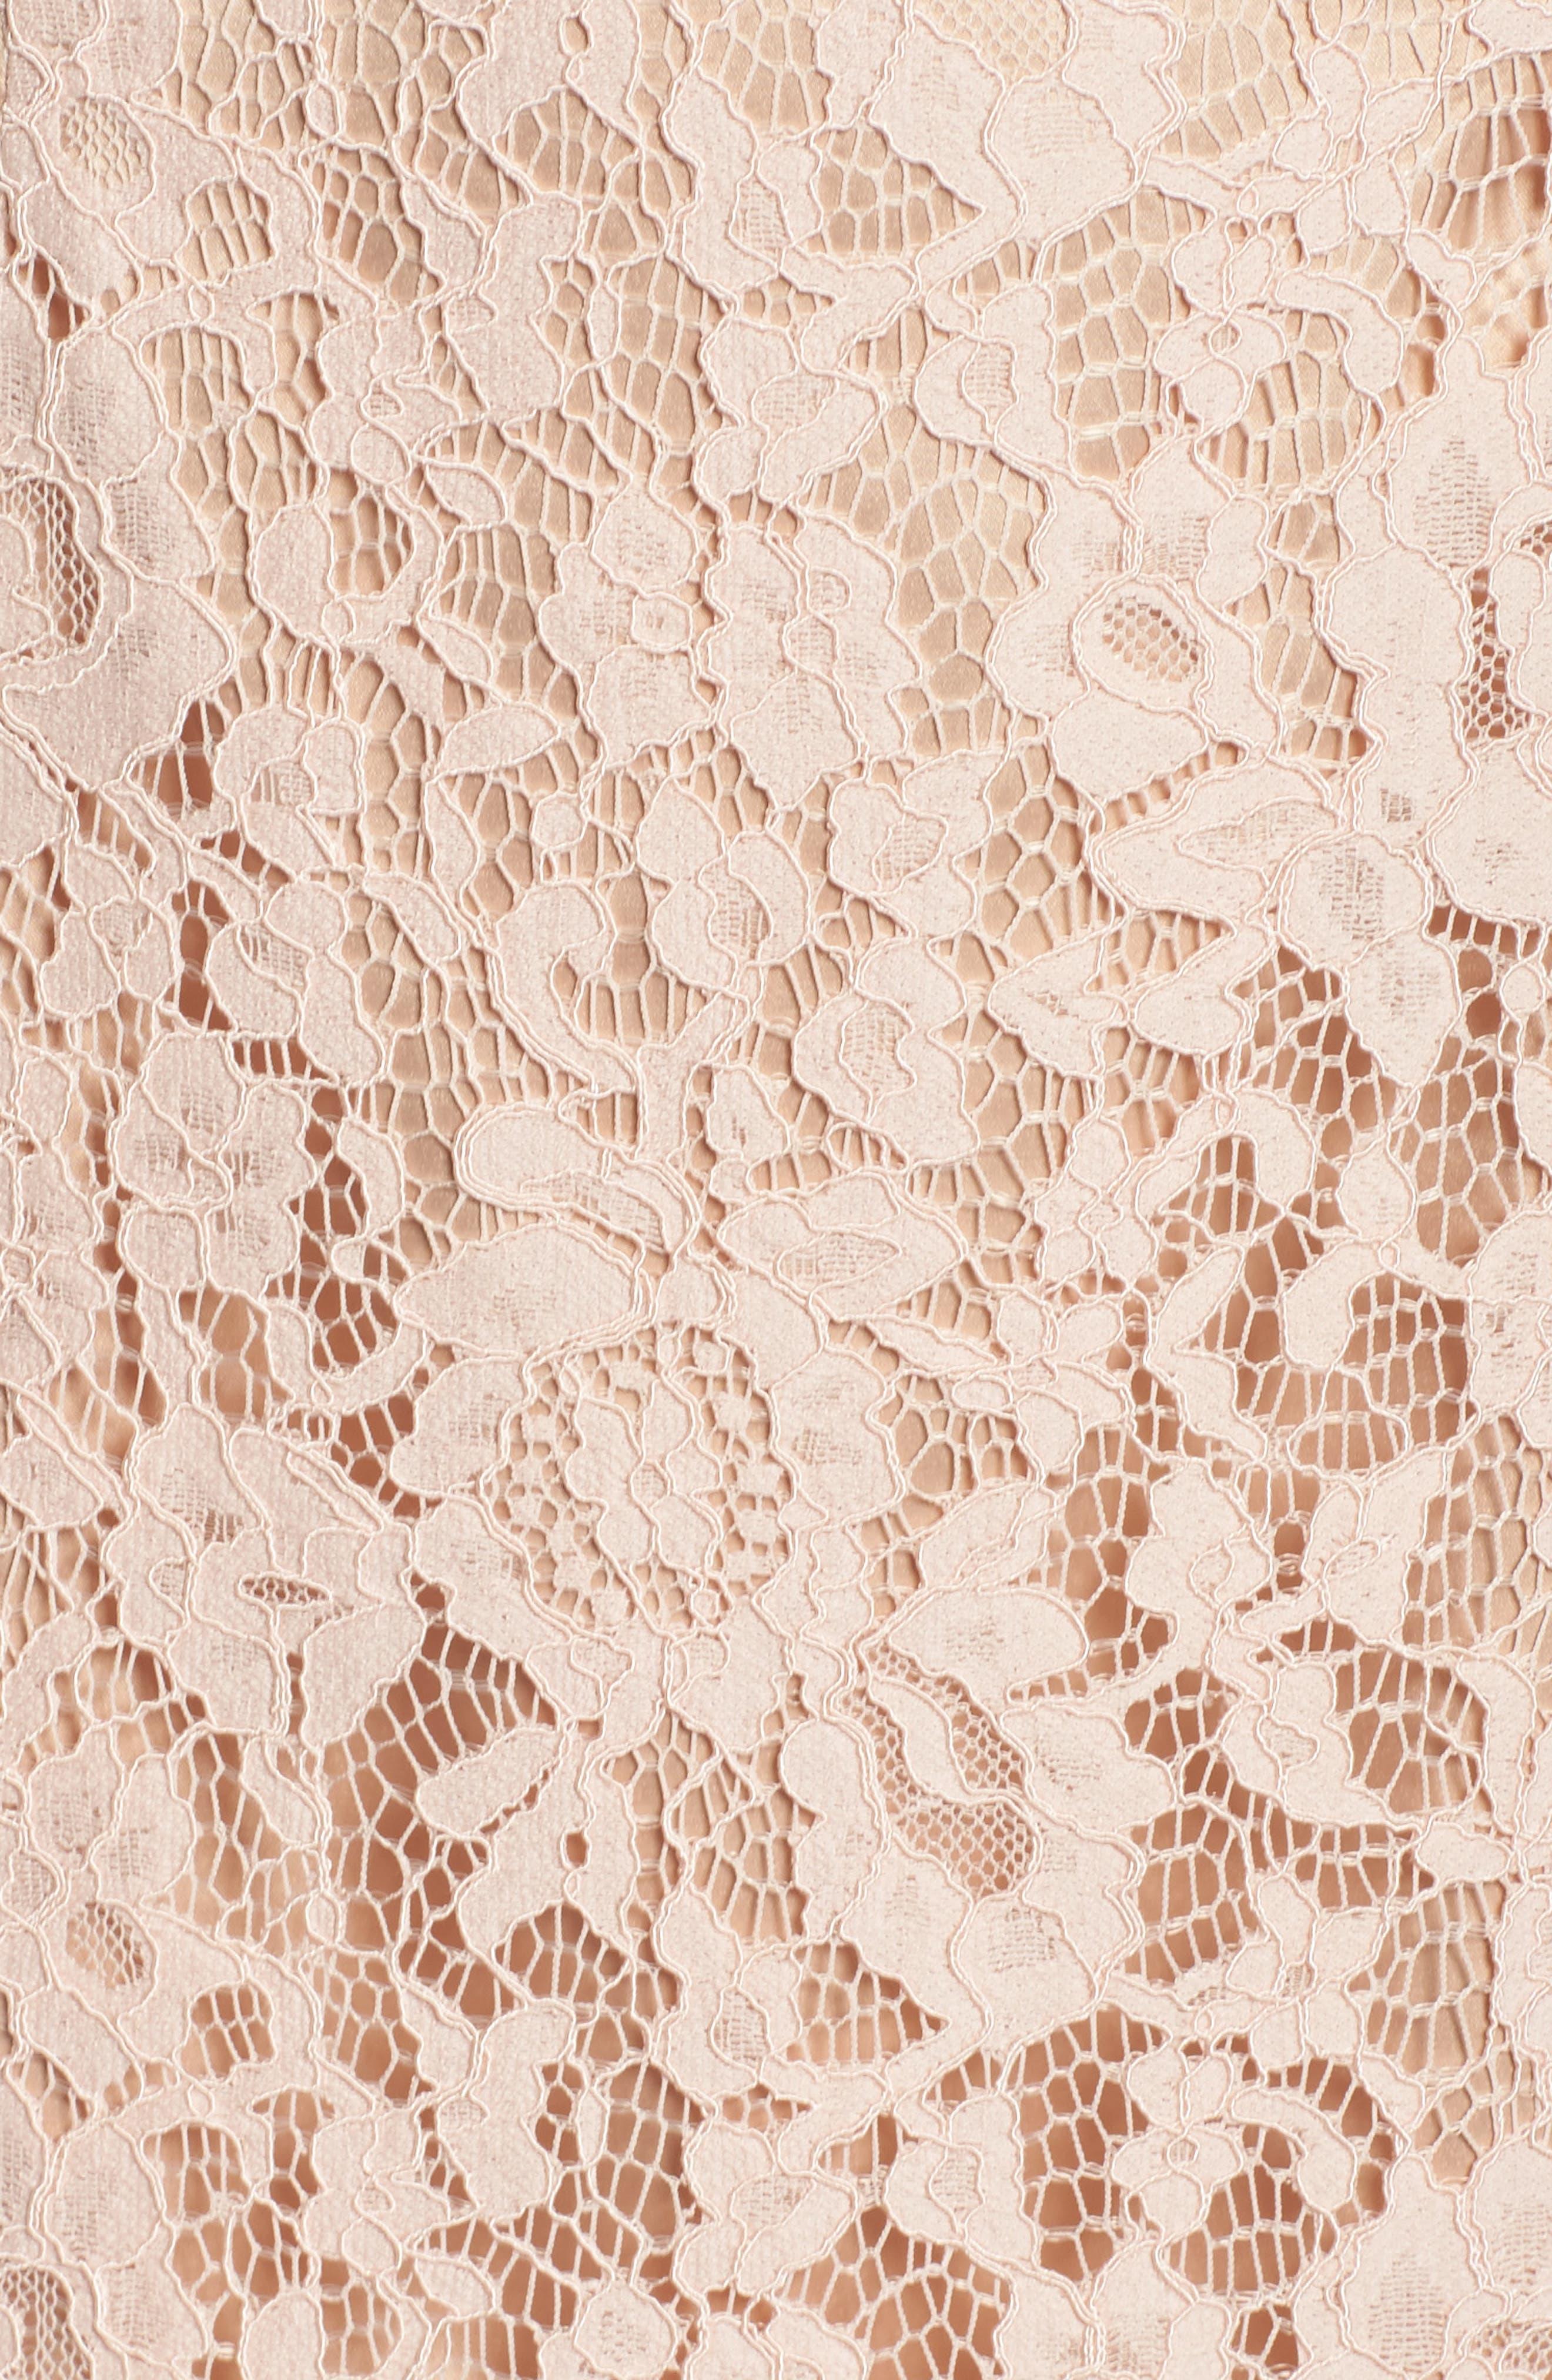 Ruffle Trim Lace Two-Piece Dress,                             Alternate thumbnail 5, color,                             651